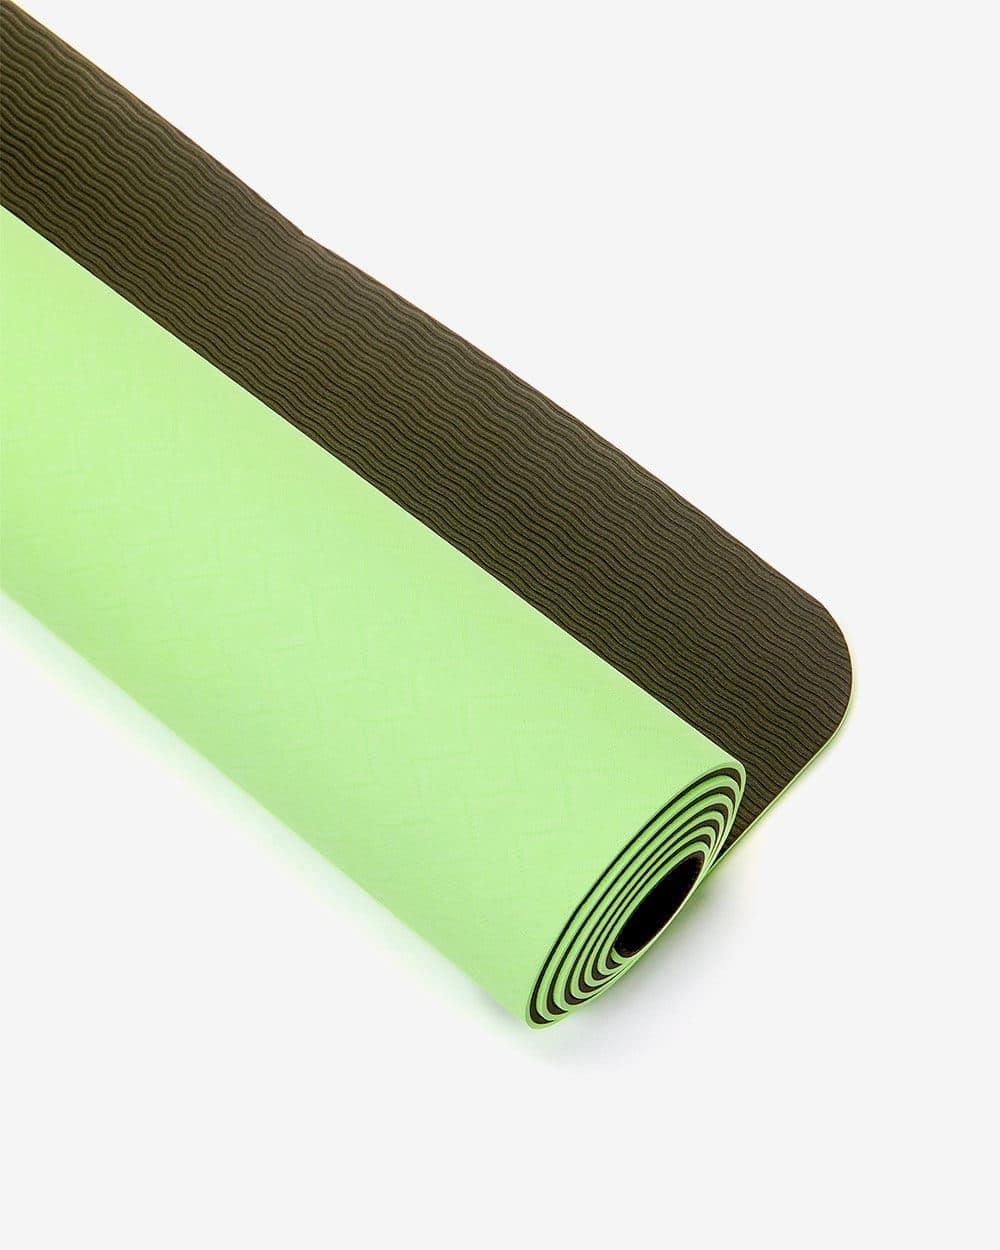 Tapis de yoga antidérapant Hyba